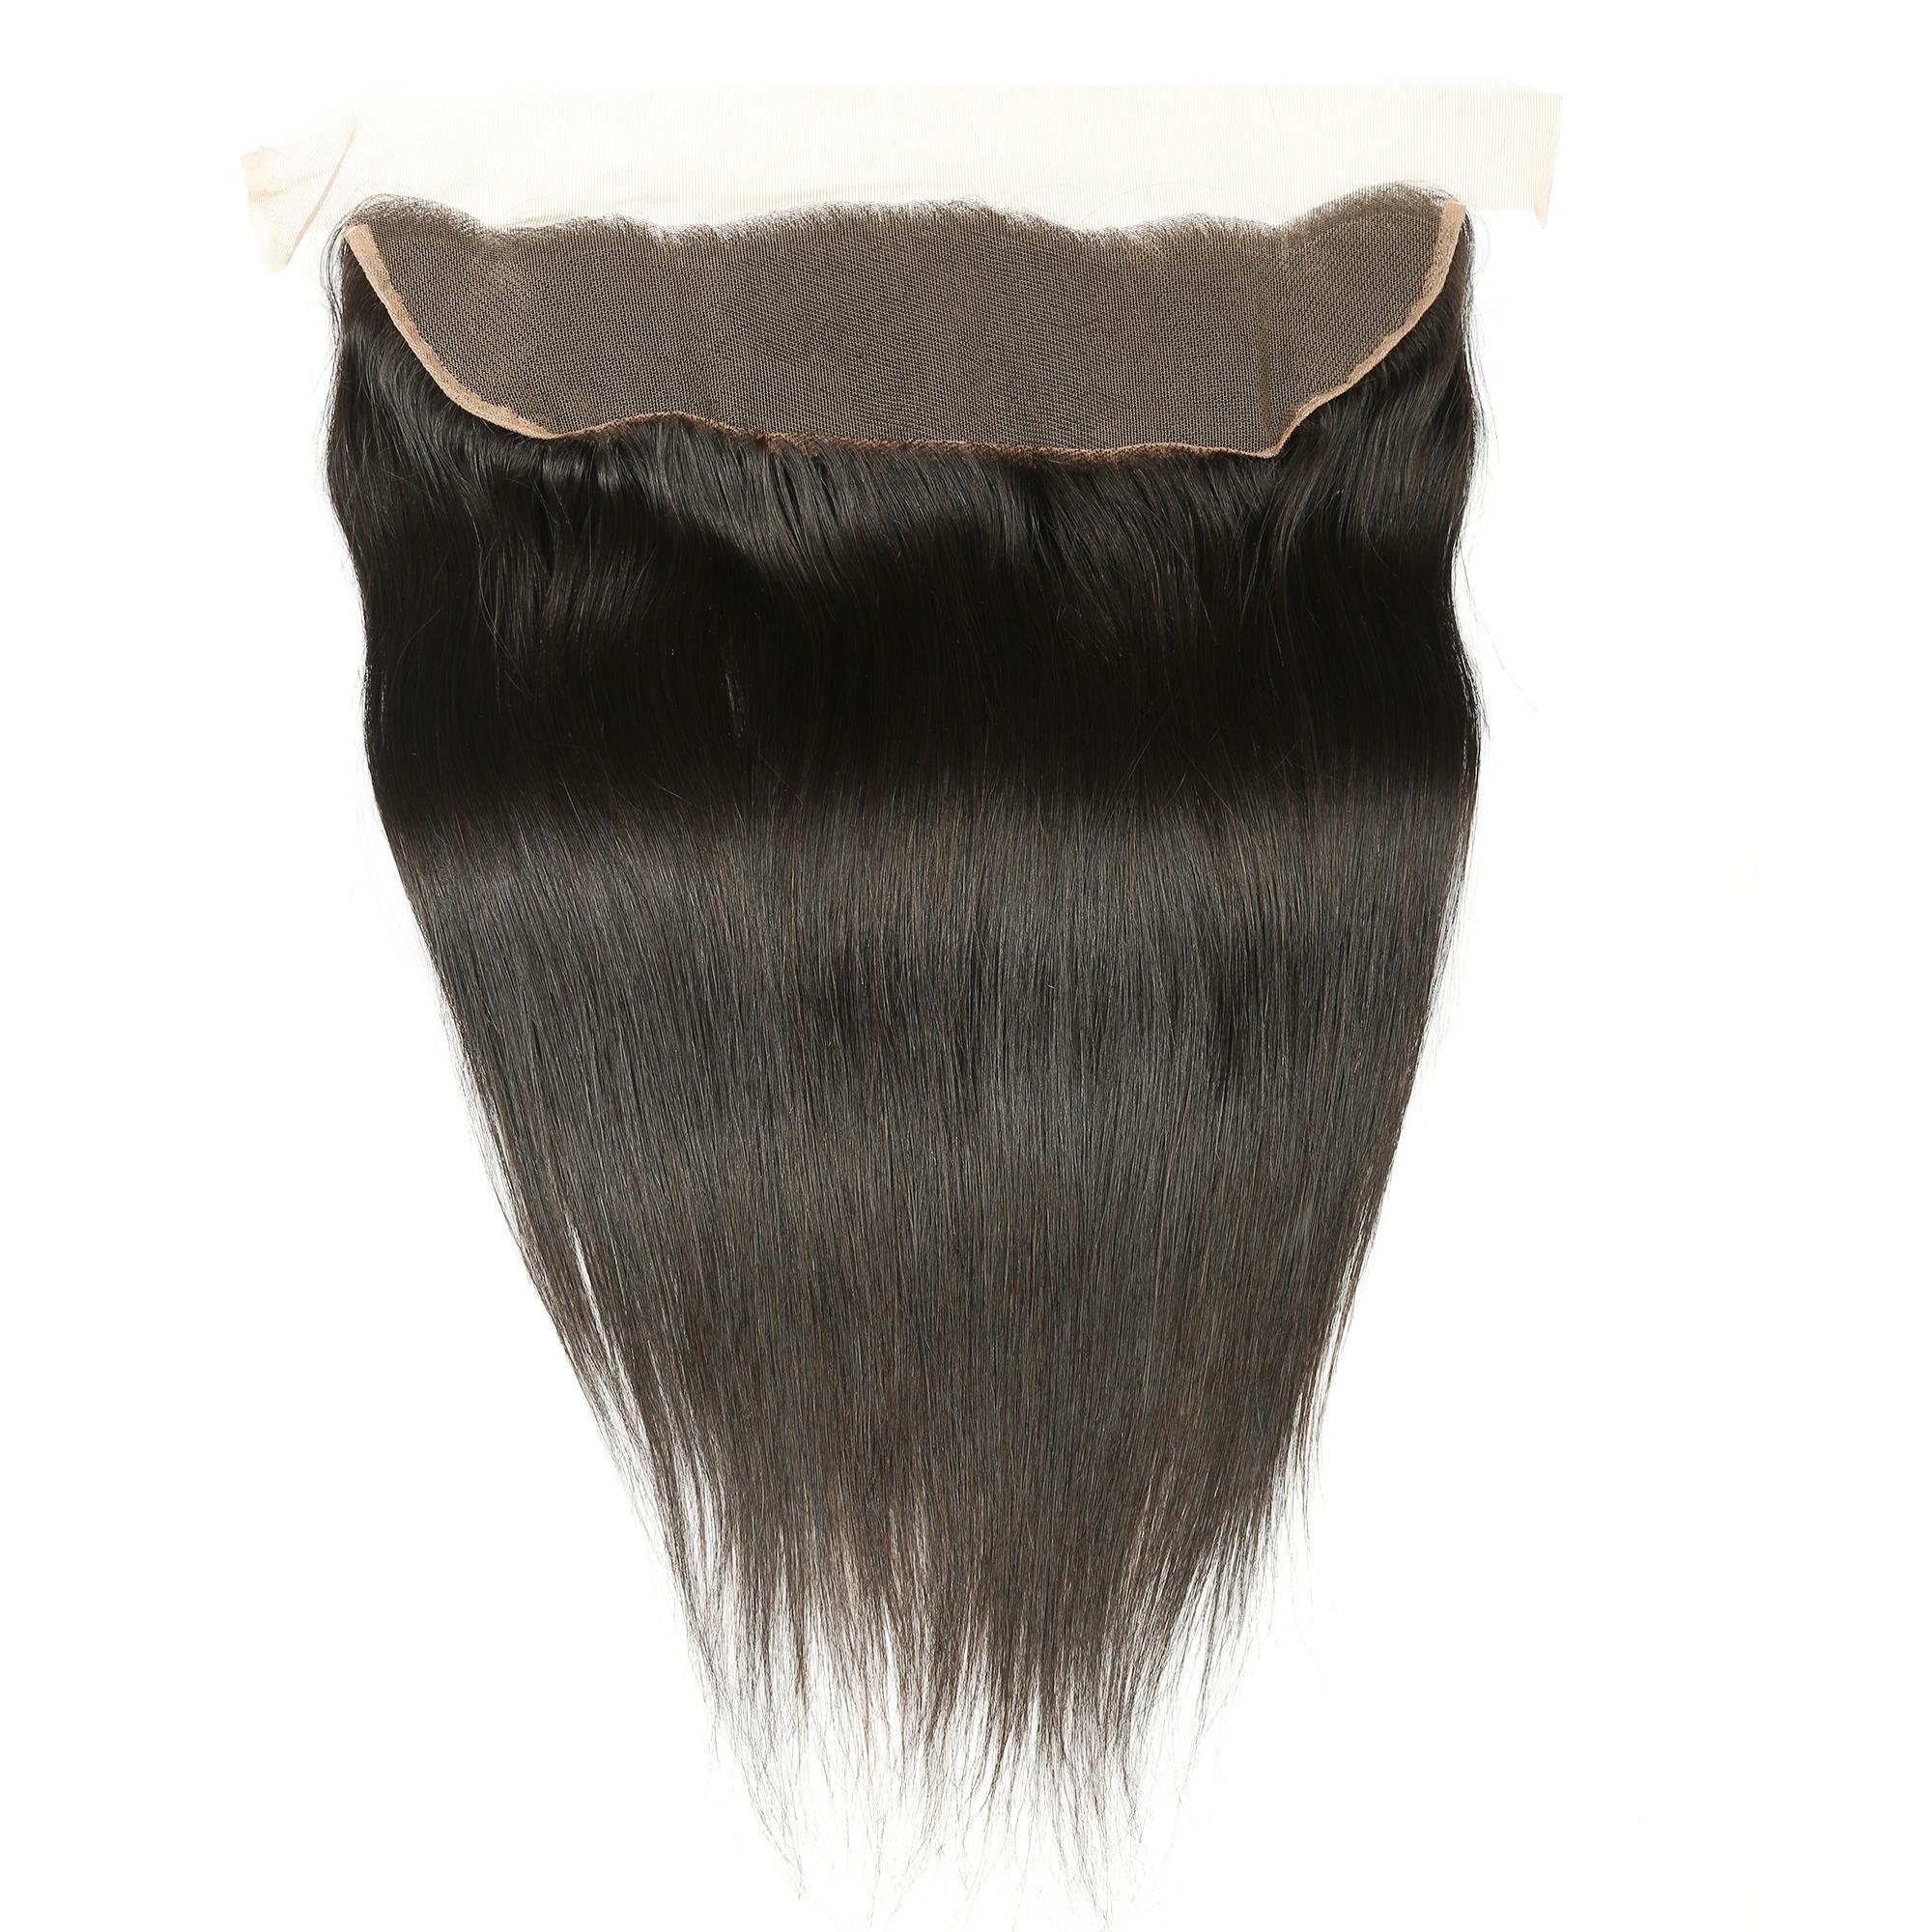 UNice Hair image 25